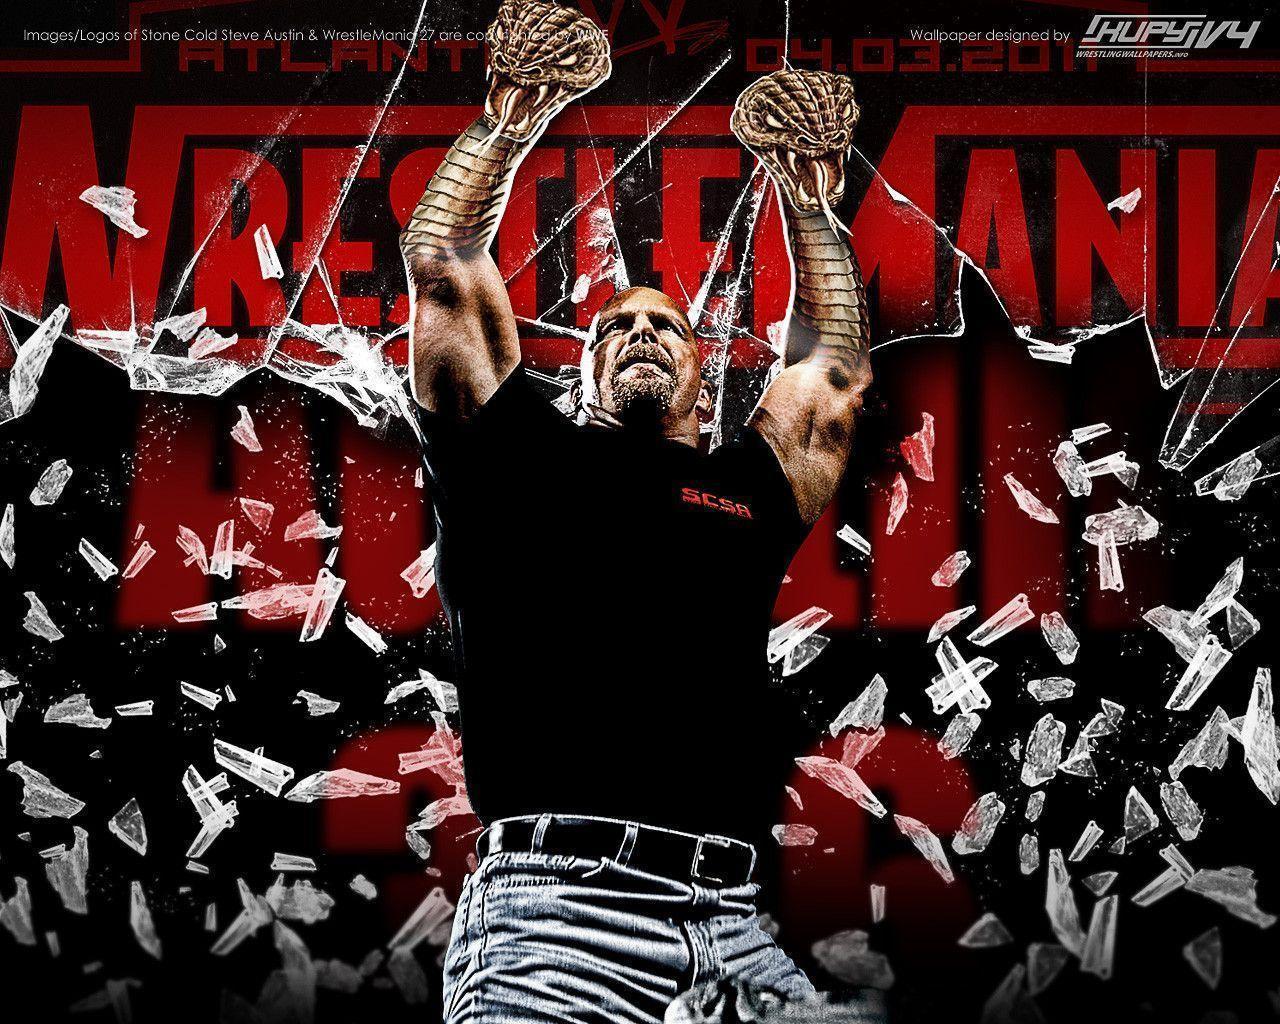 Kupy Wrestling Wallpapers 1280x1024